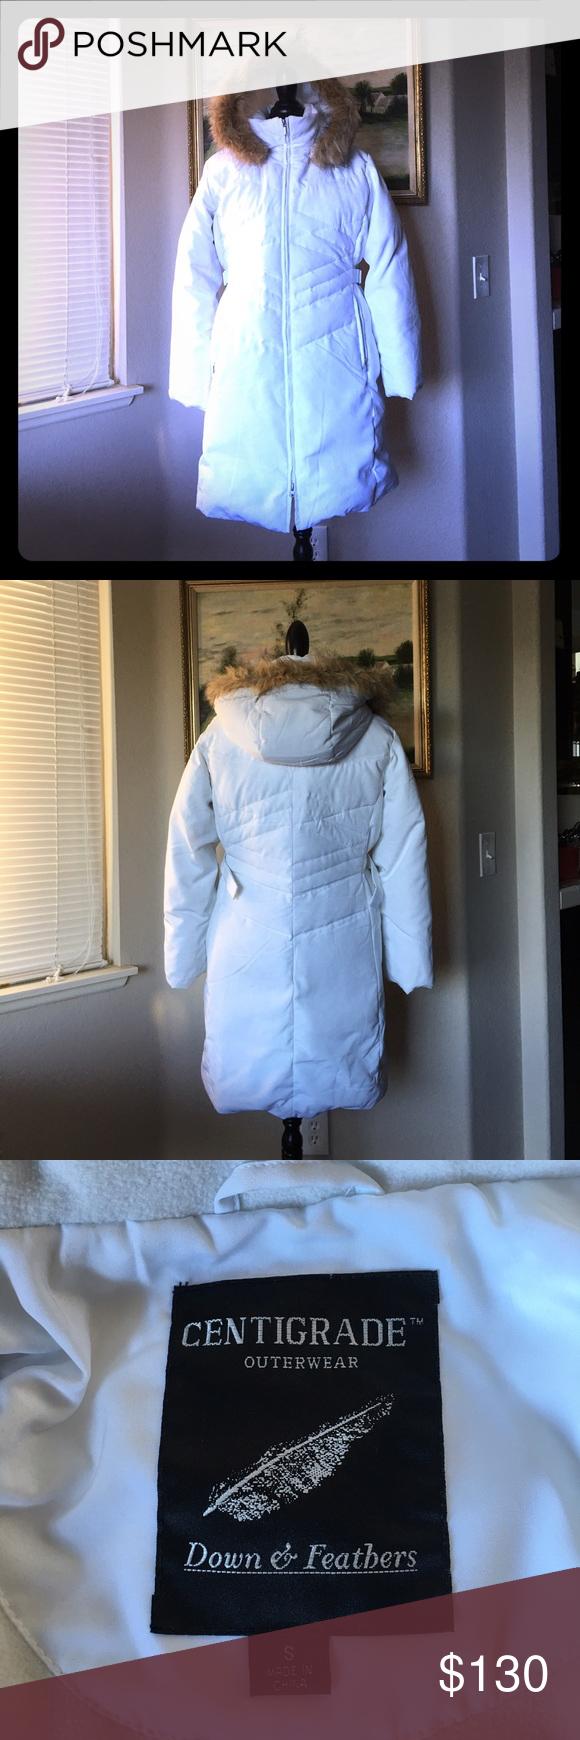 Centigrade Like New Down Jacket Detachable Hood Clothes Design Down Jacket Outerwear Jackets [ 1740 x 580 Pixel ]